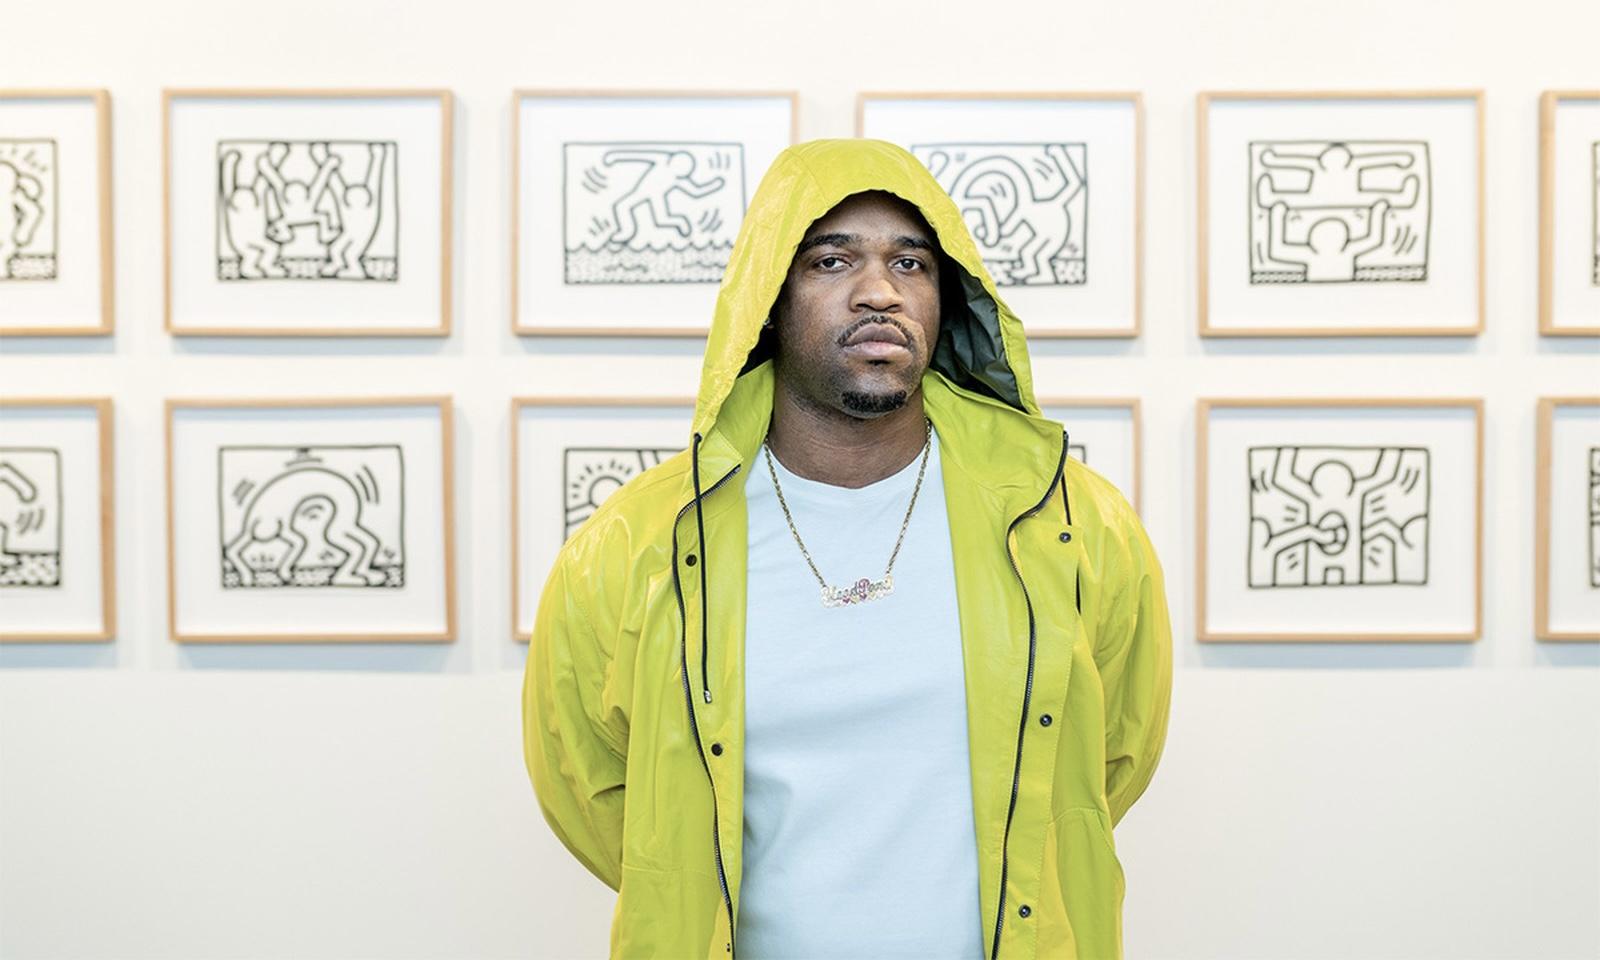 苏富比正在拍卖 Keith Haring 的 12 幅画作